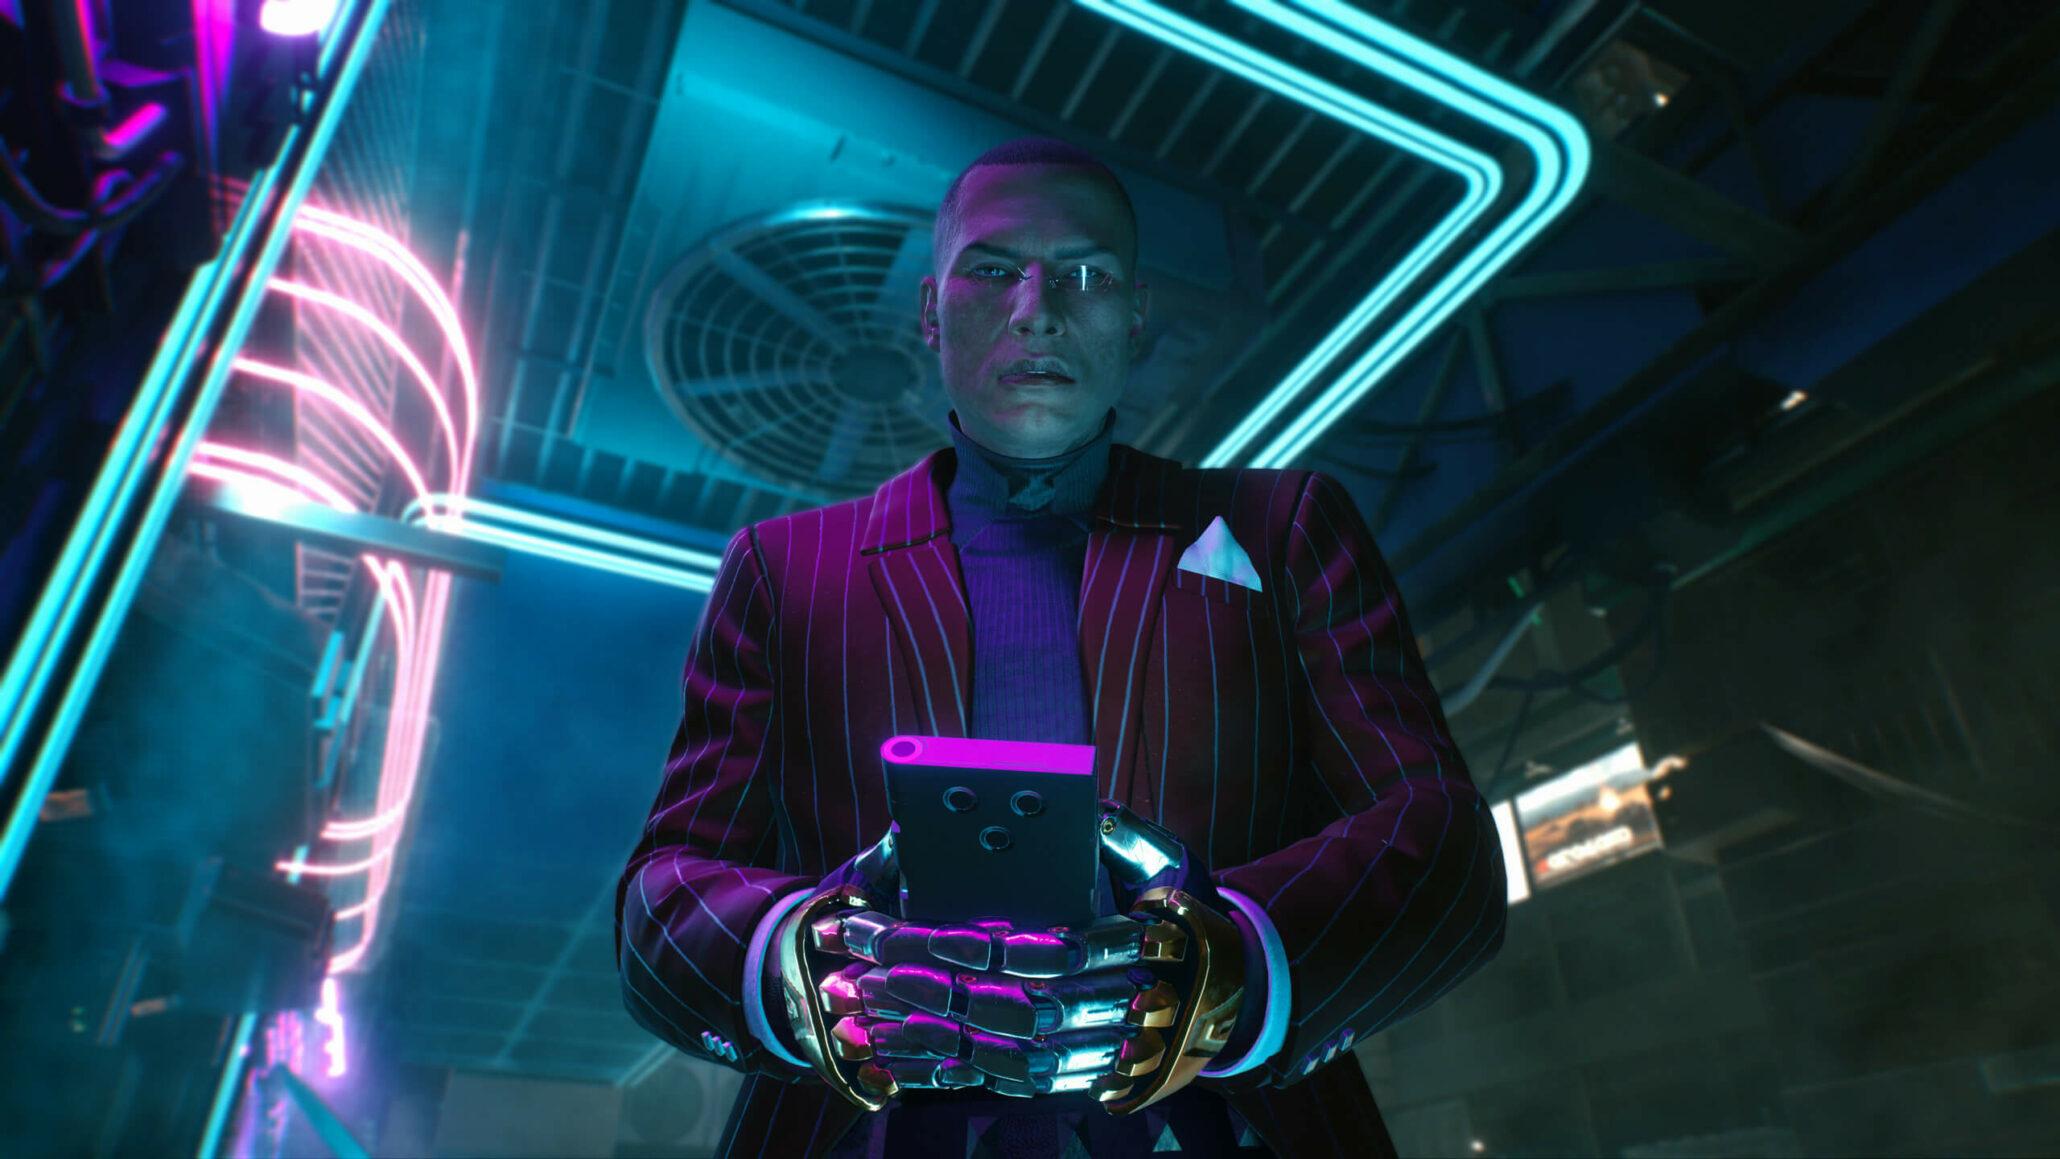 Cyberpunk 2077 Comparison Video Highlights Improvements ...